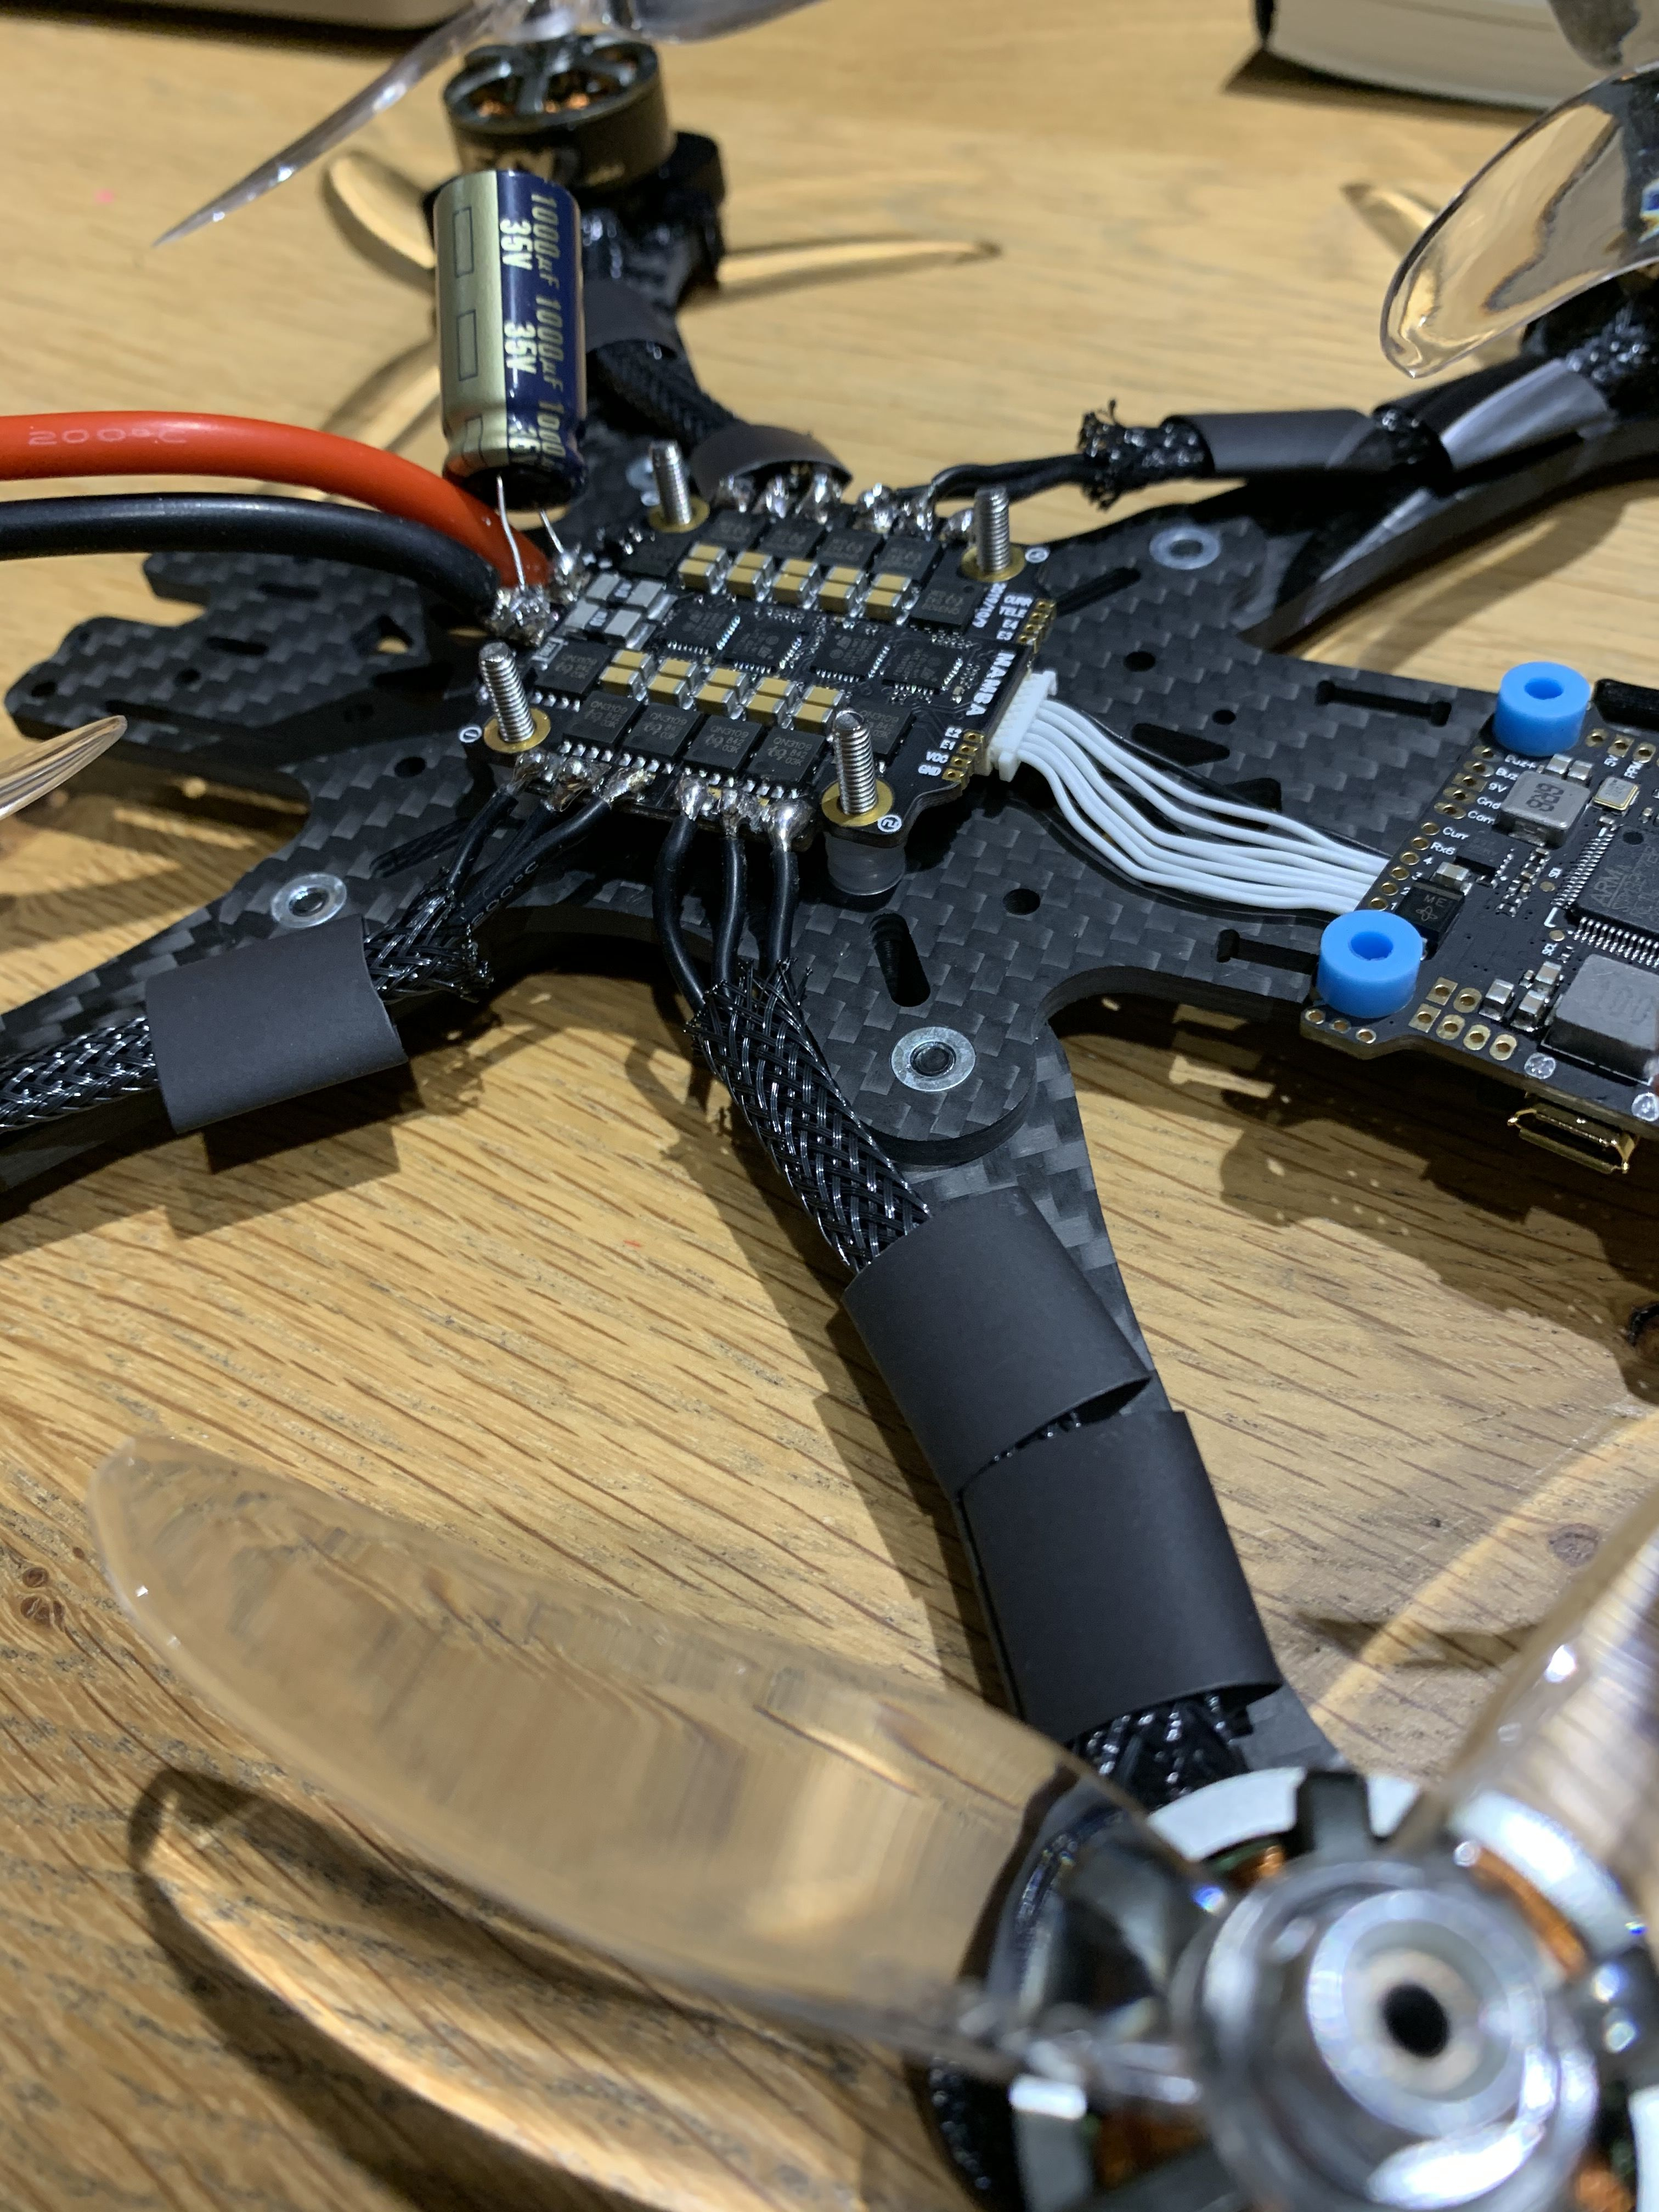 First Build - Tbs Source One - Mamba F722 - Spektrum